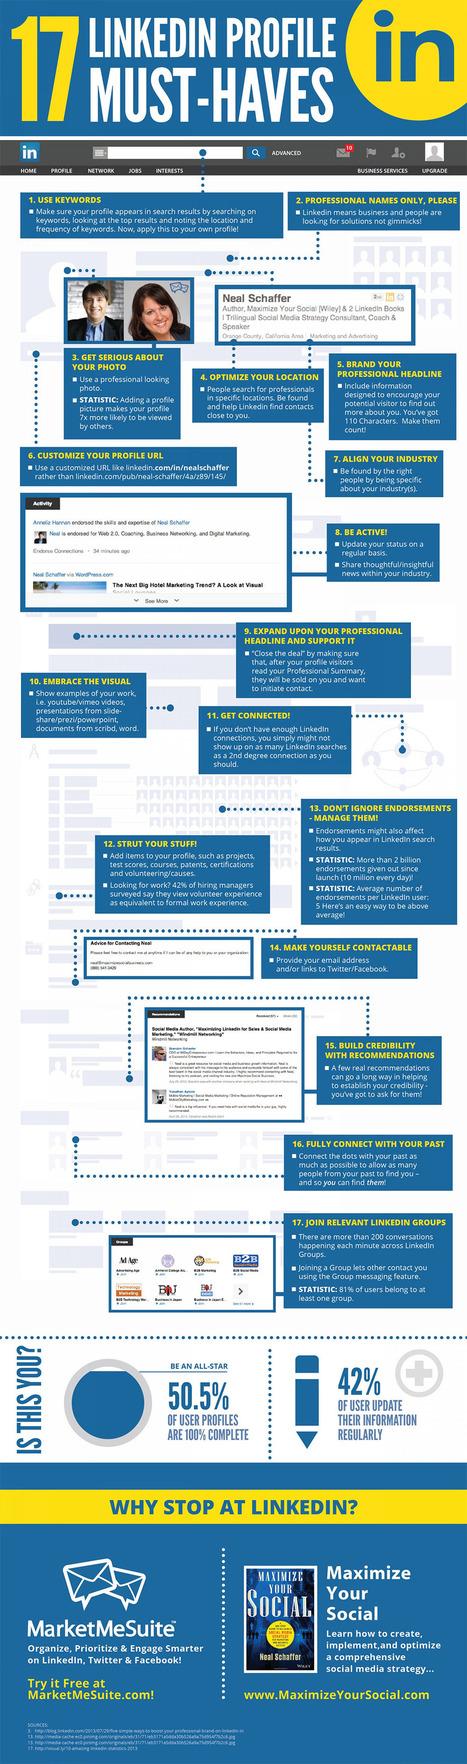 17 trucs indispensables pour votre profil Linkedin #PersonalBranding | Social Media | Scoop.it